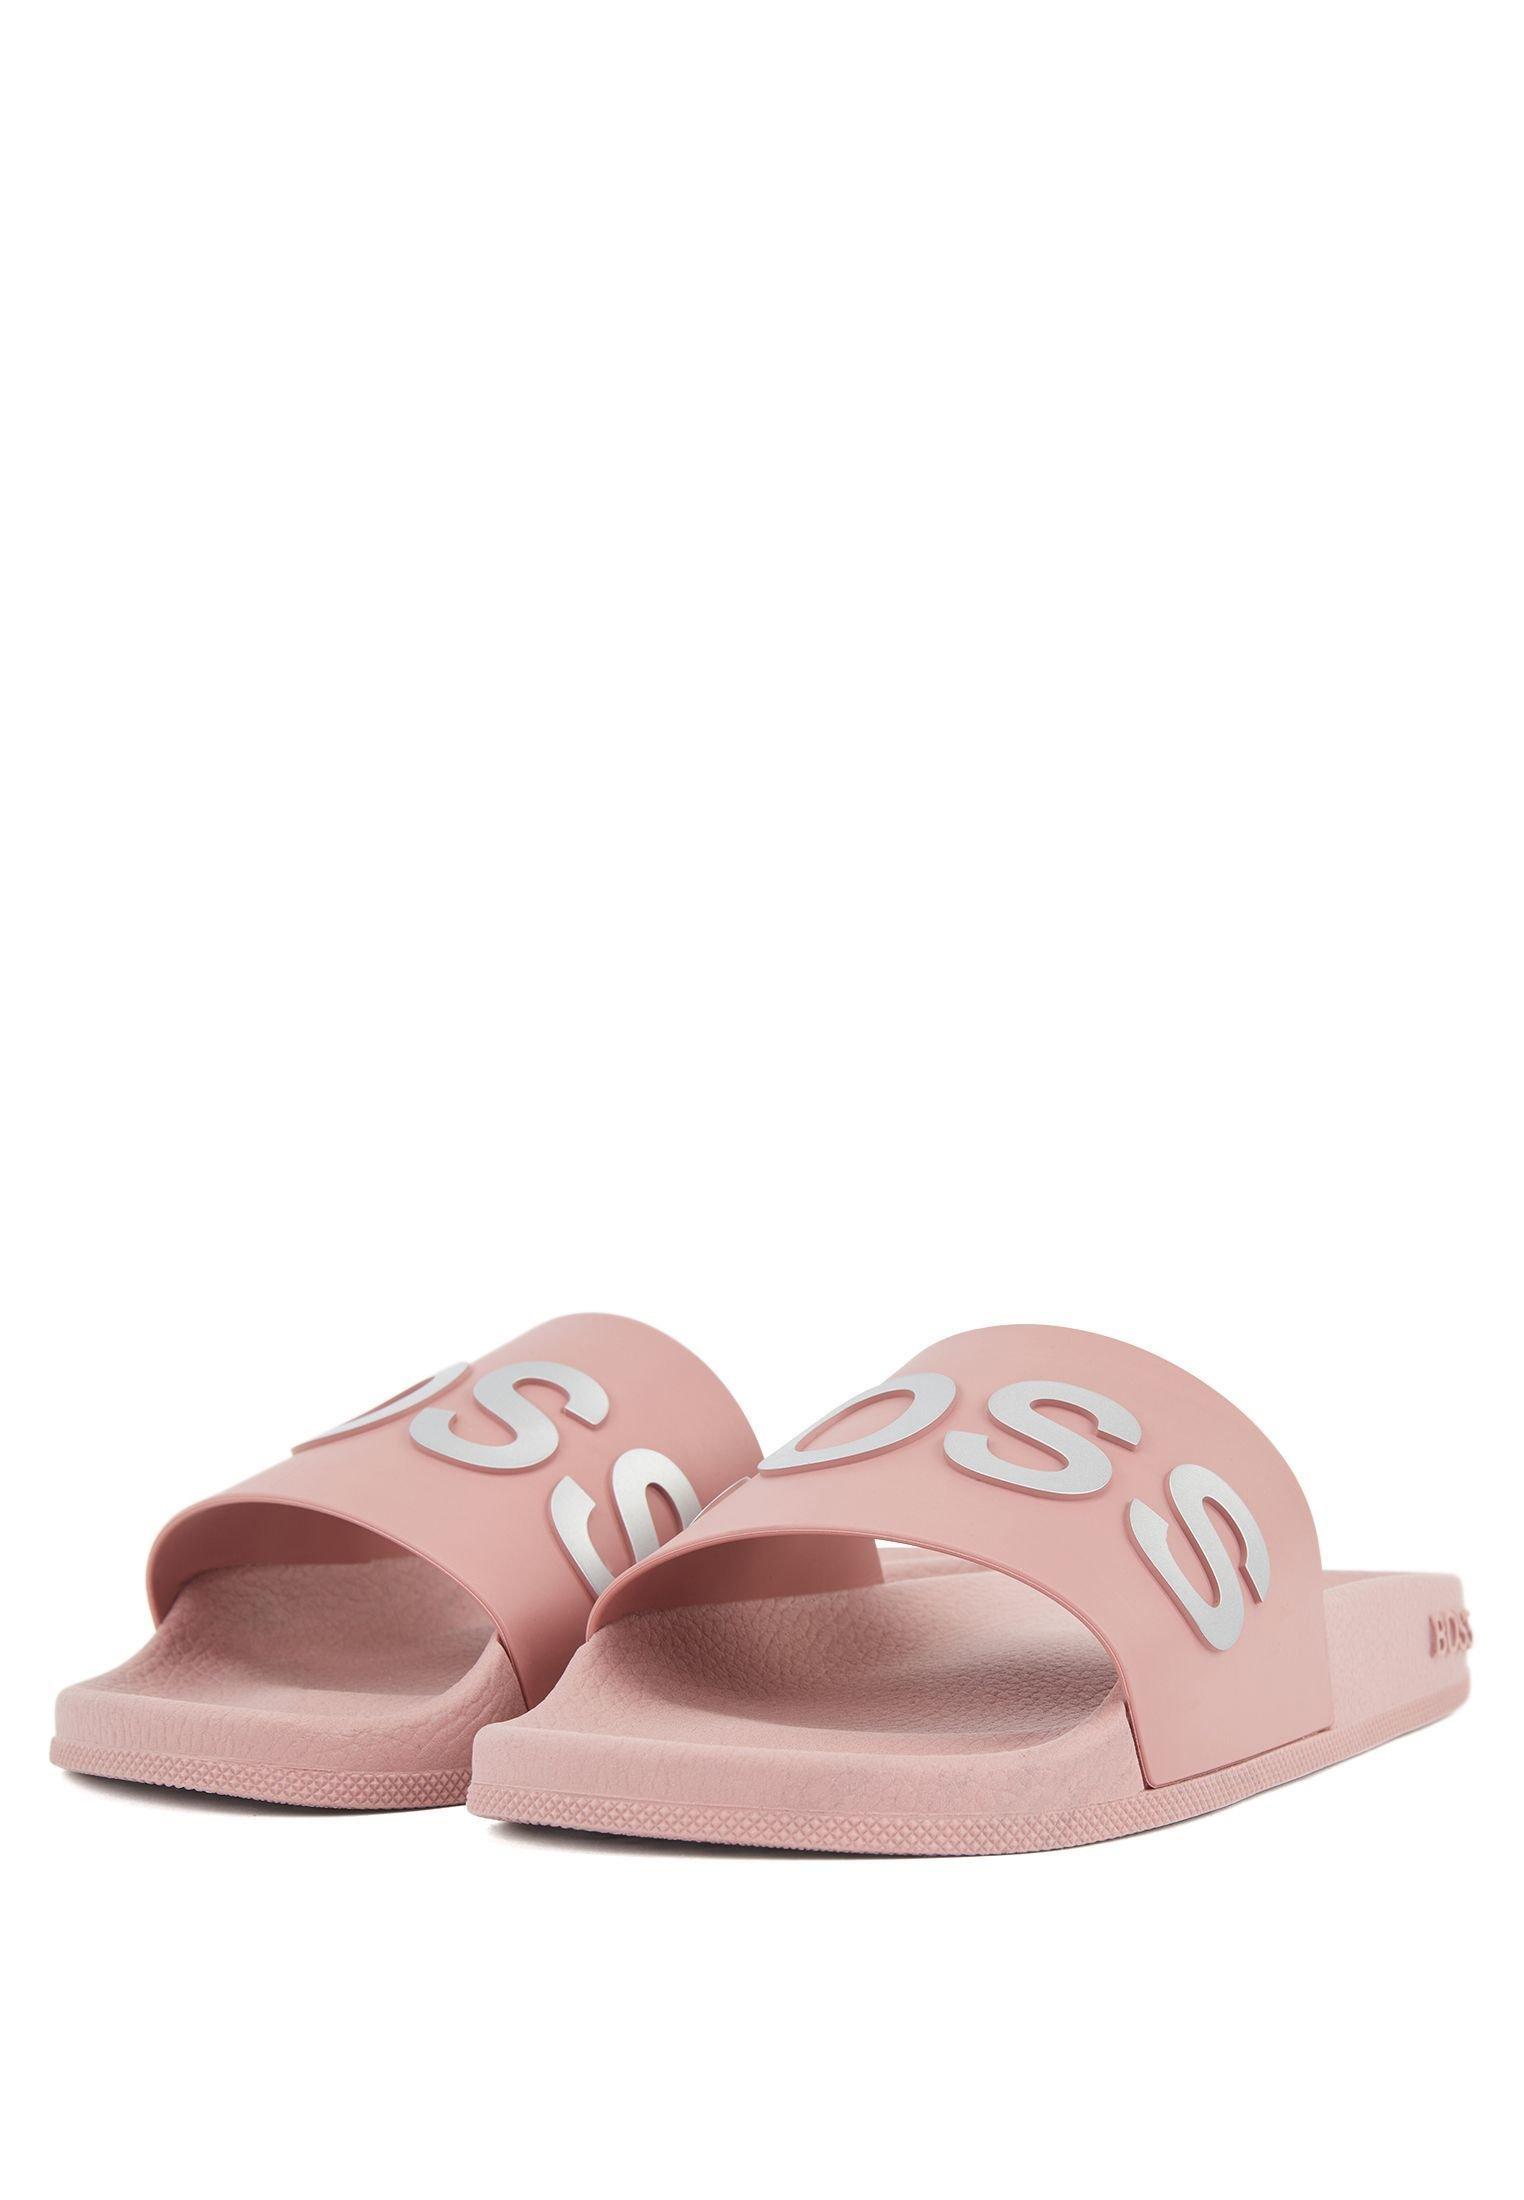 Boss Bay_slid_rblg - Badesandaler Light Pink